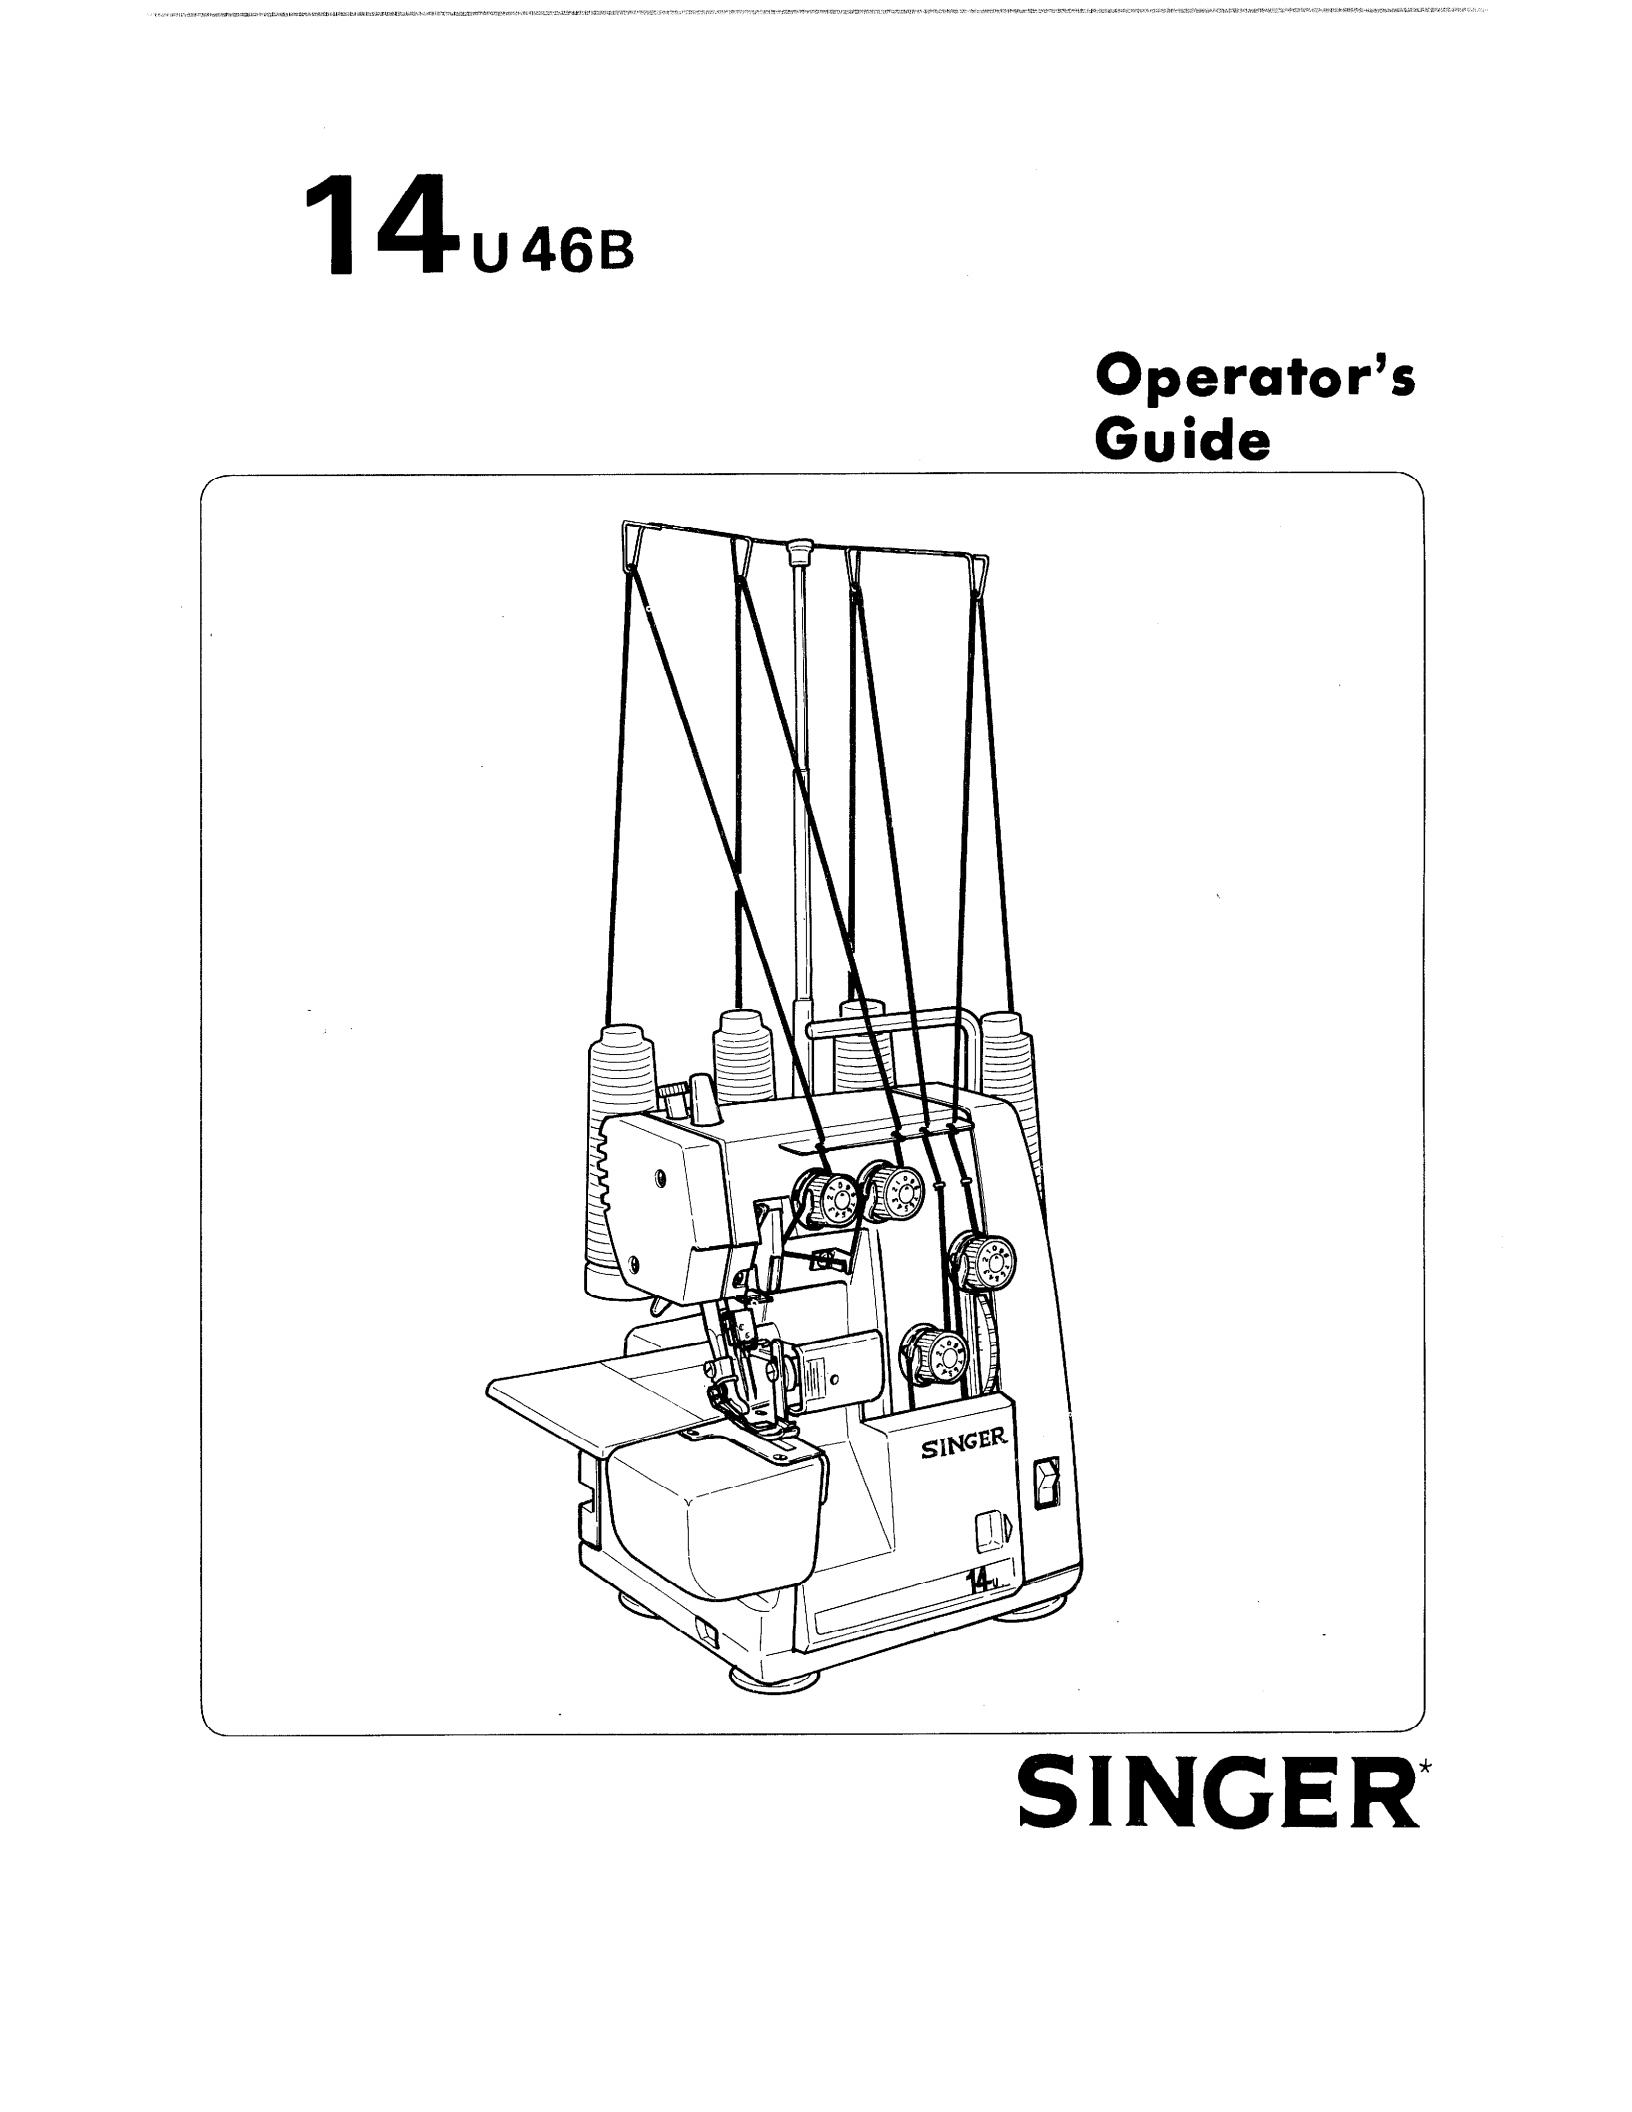 Singer 14u46b